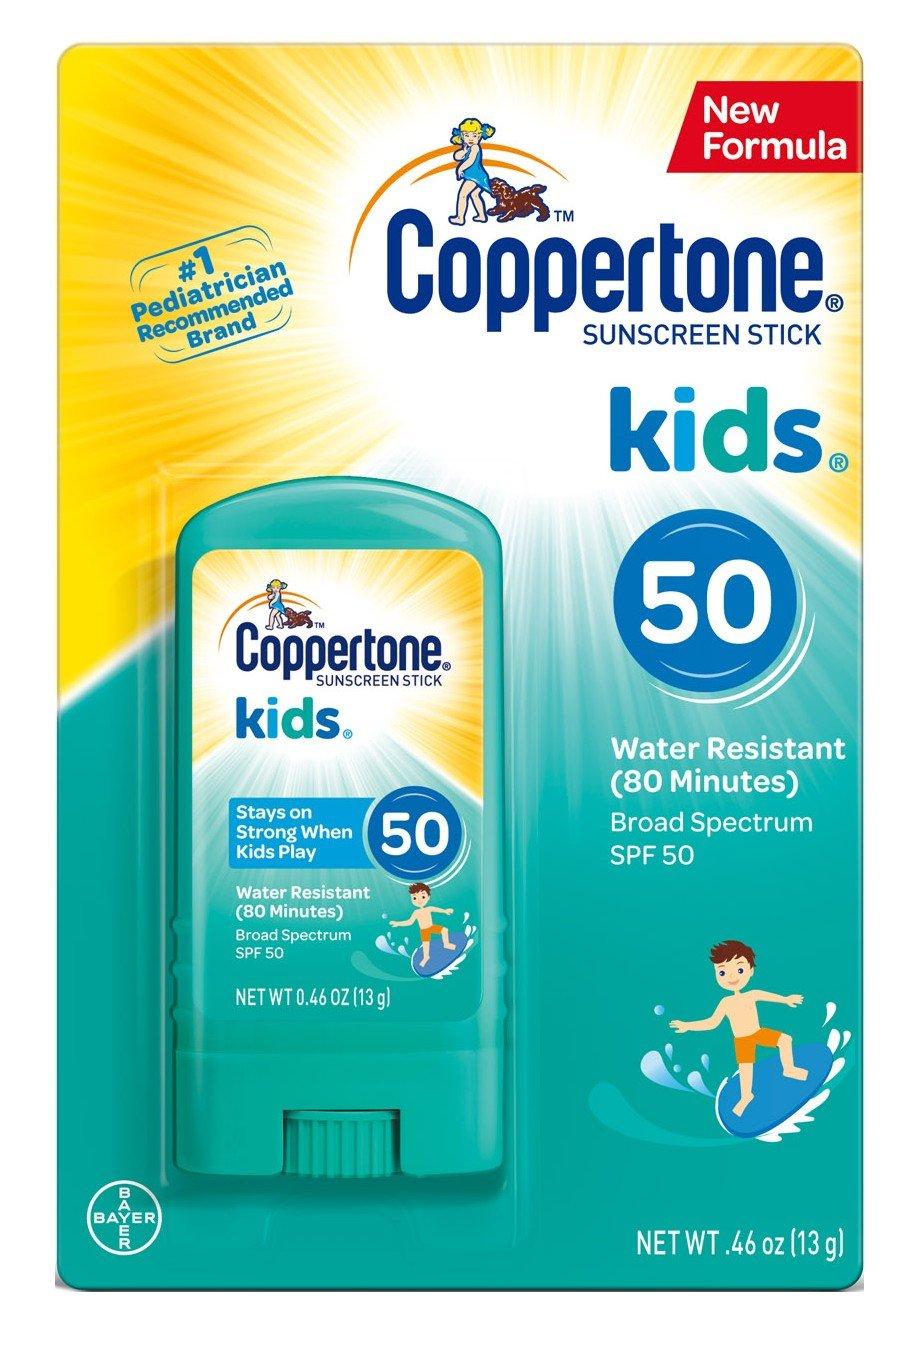 Coppertone Kids Sunscreen Stick Broad Spectrum SPF 50, .46 Ounces each (6)